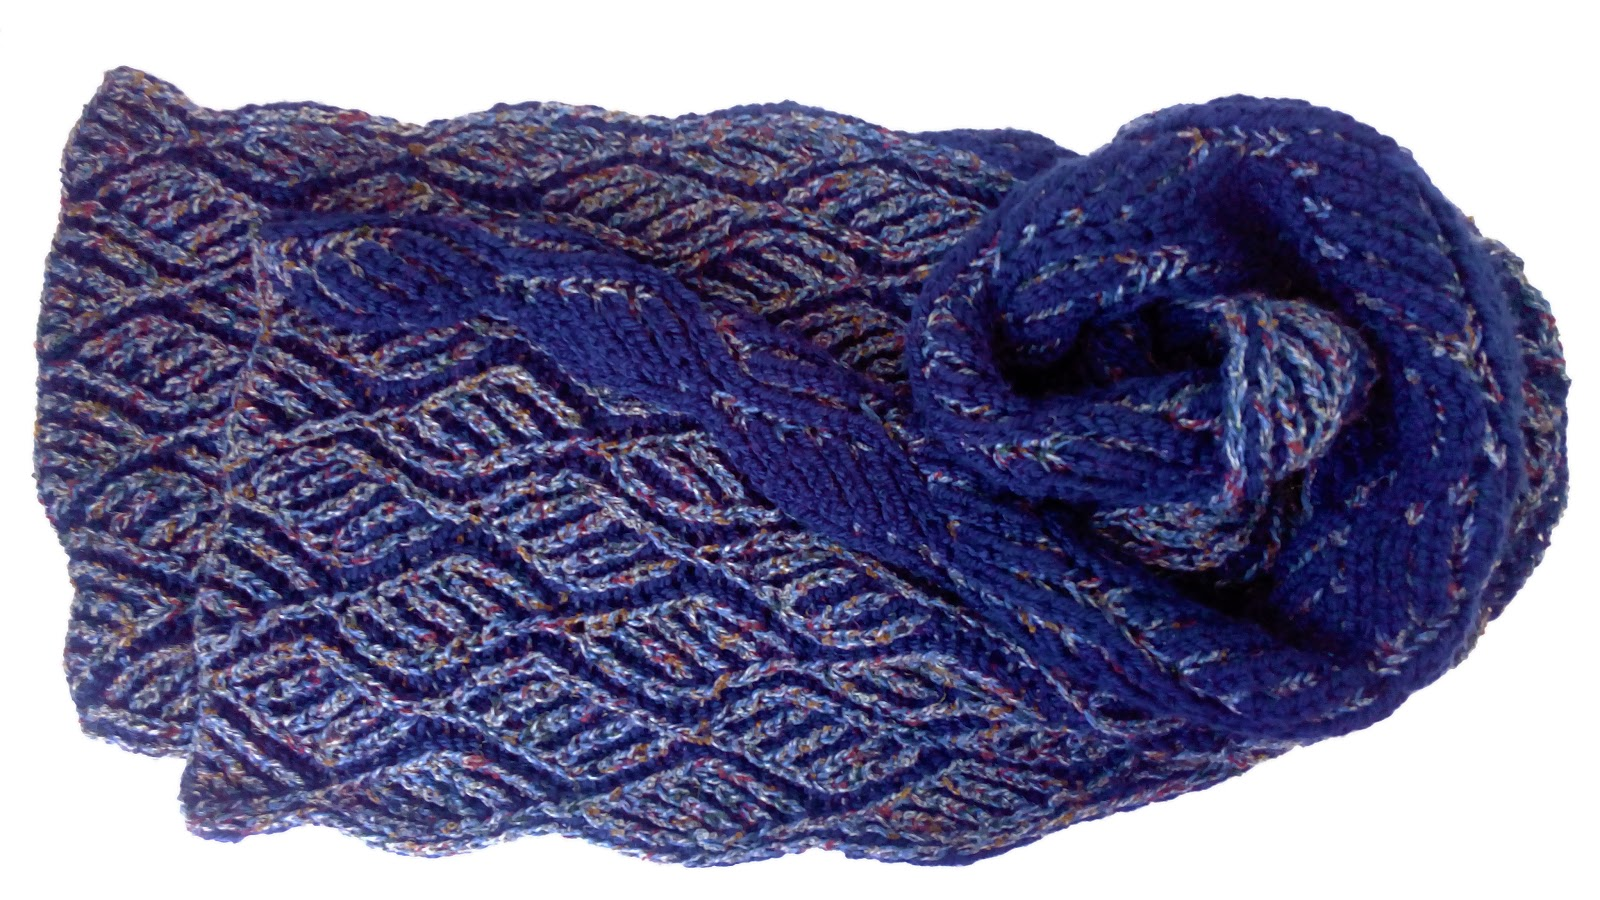 Diamonds Scarf - Brioche Knitting